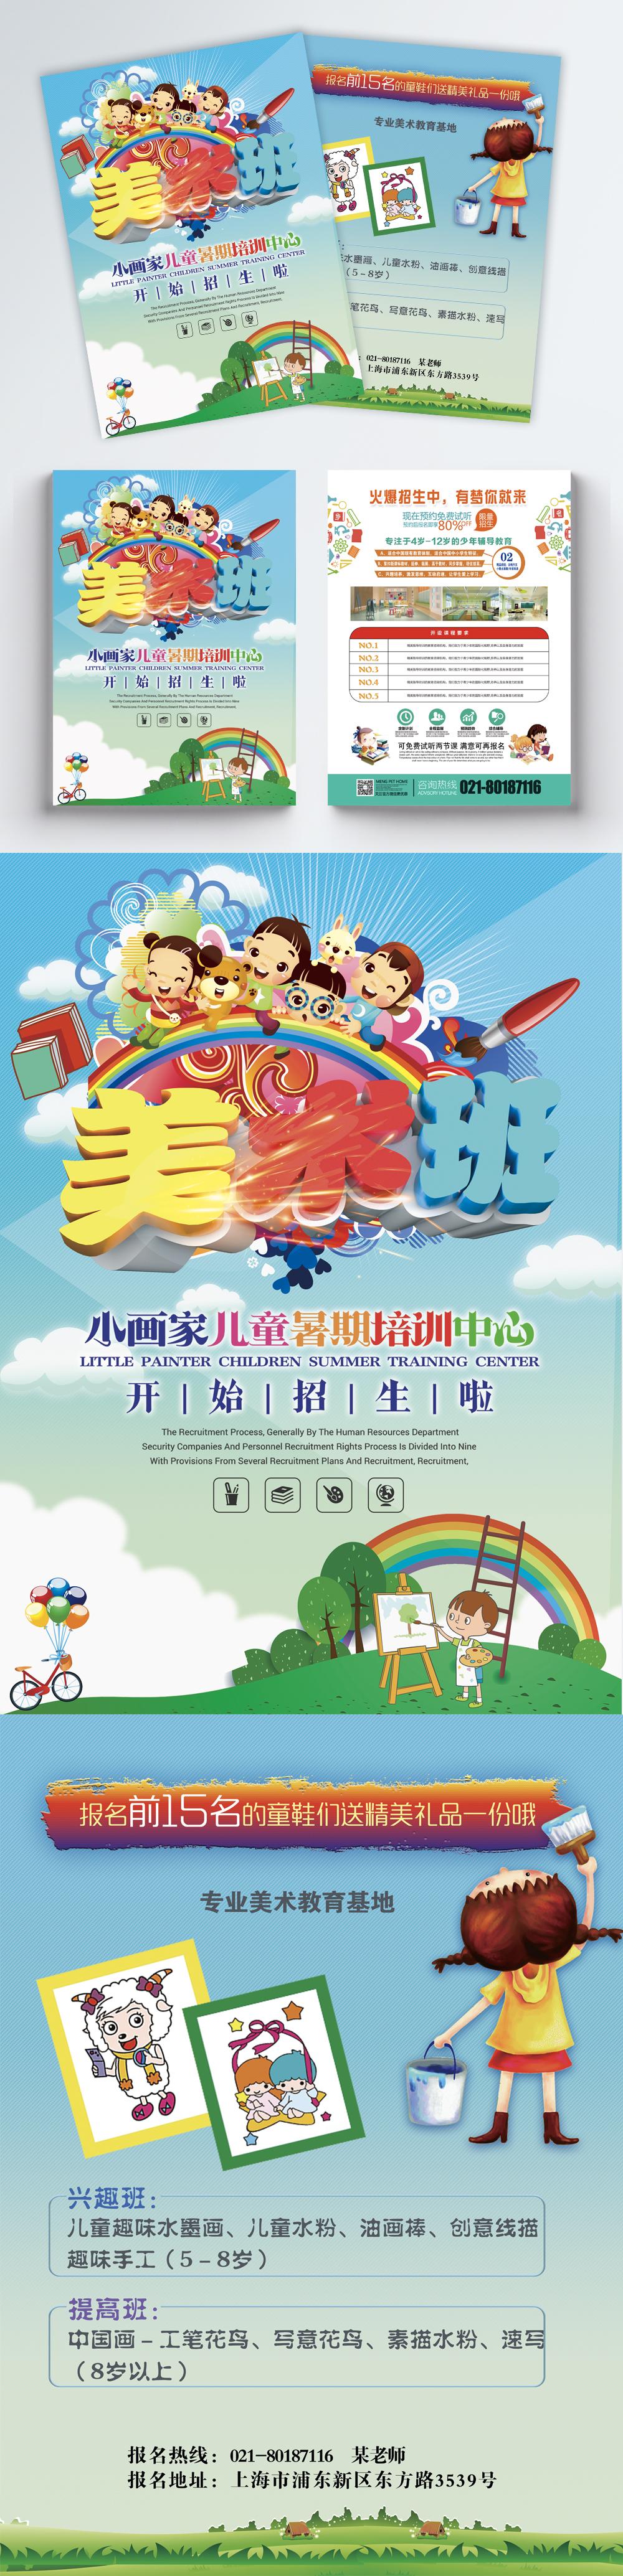 Volantes creativos para niños